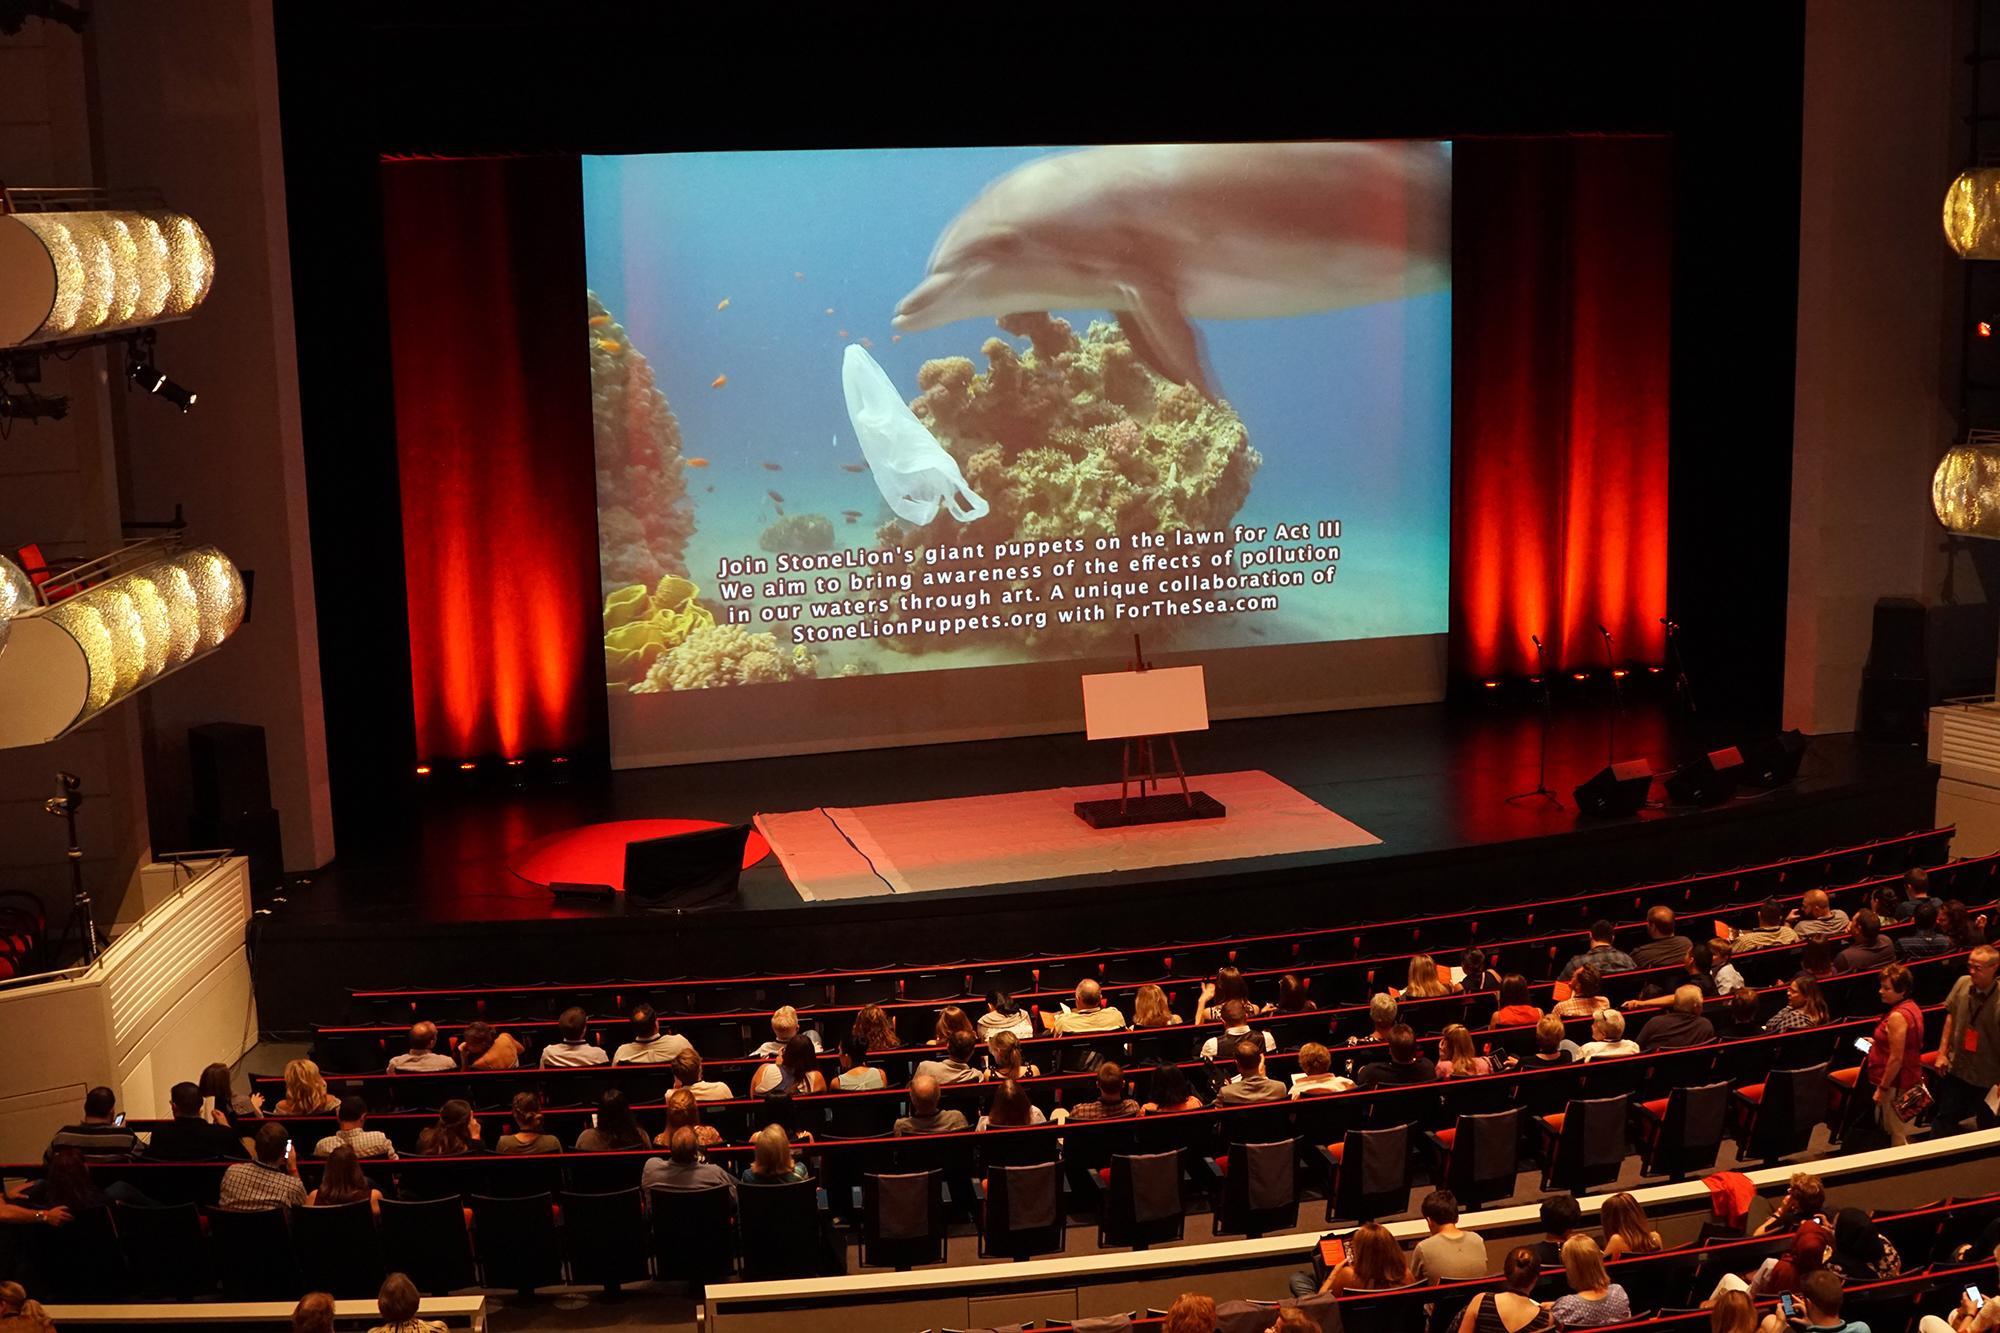 TEDx Dolphin screen